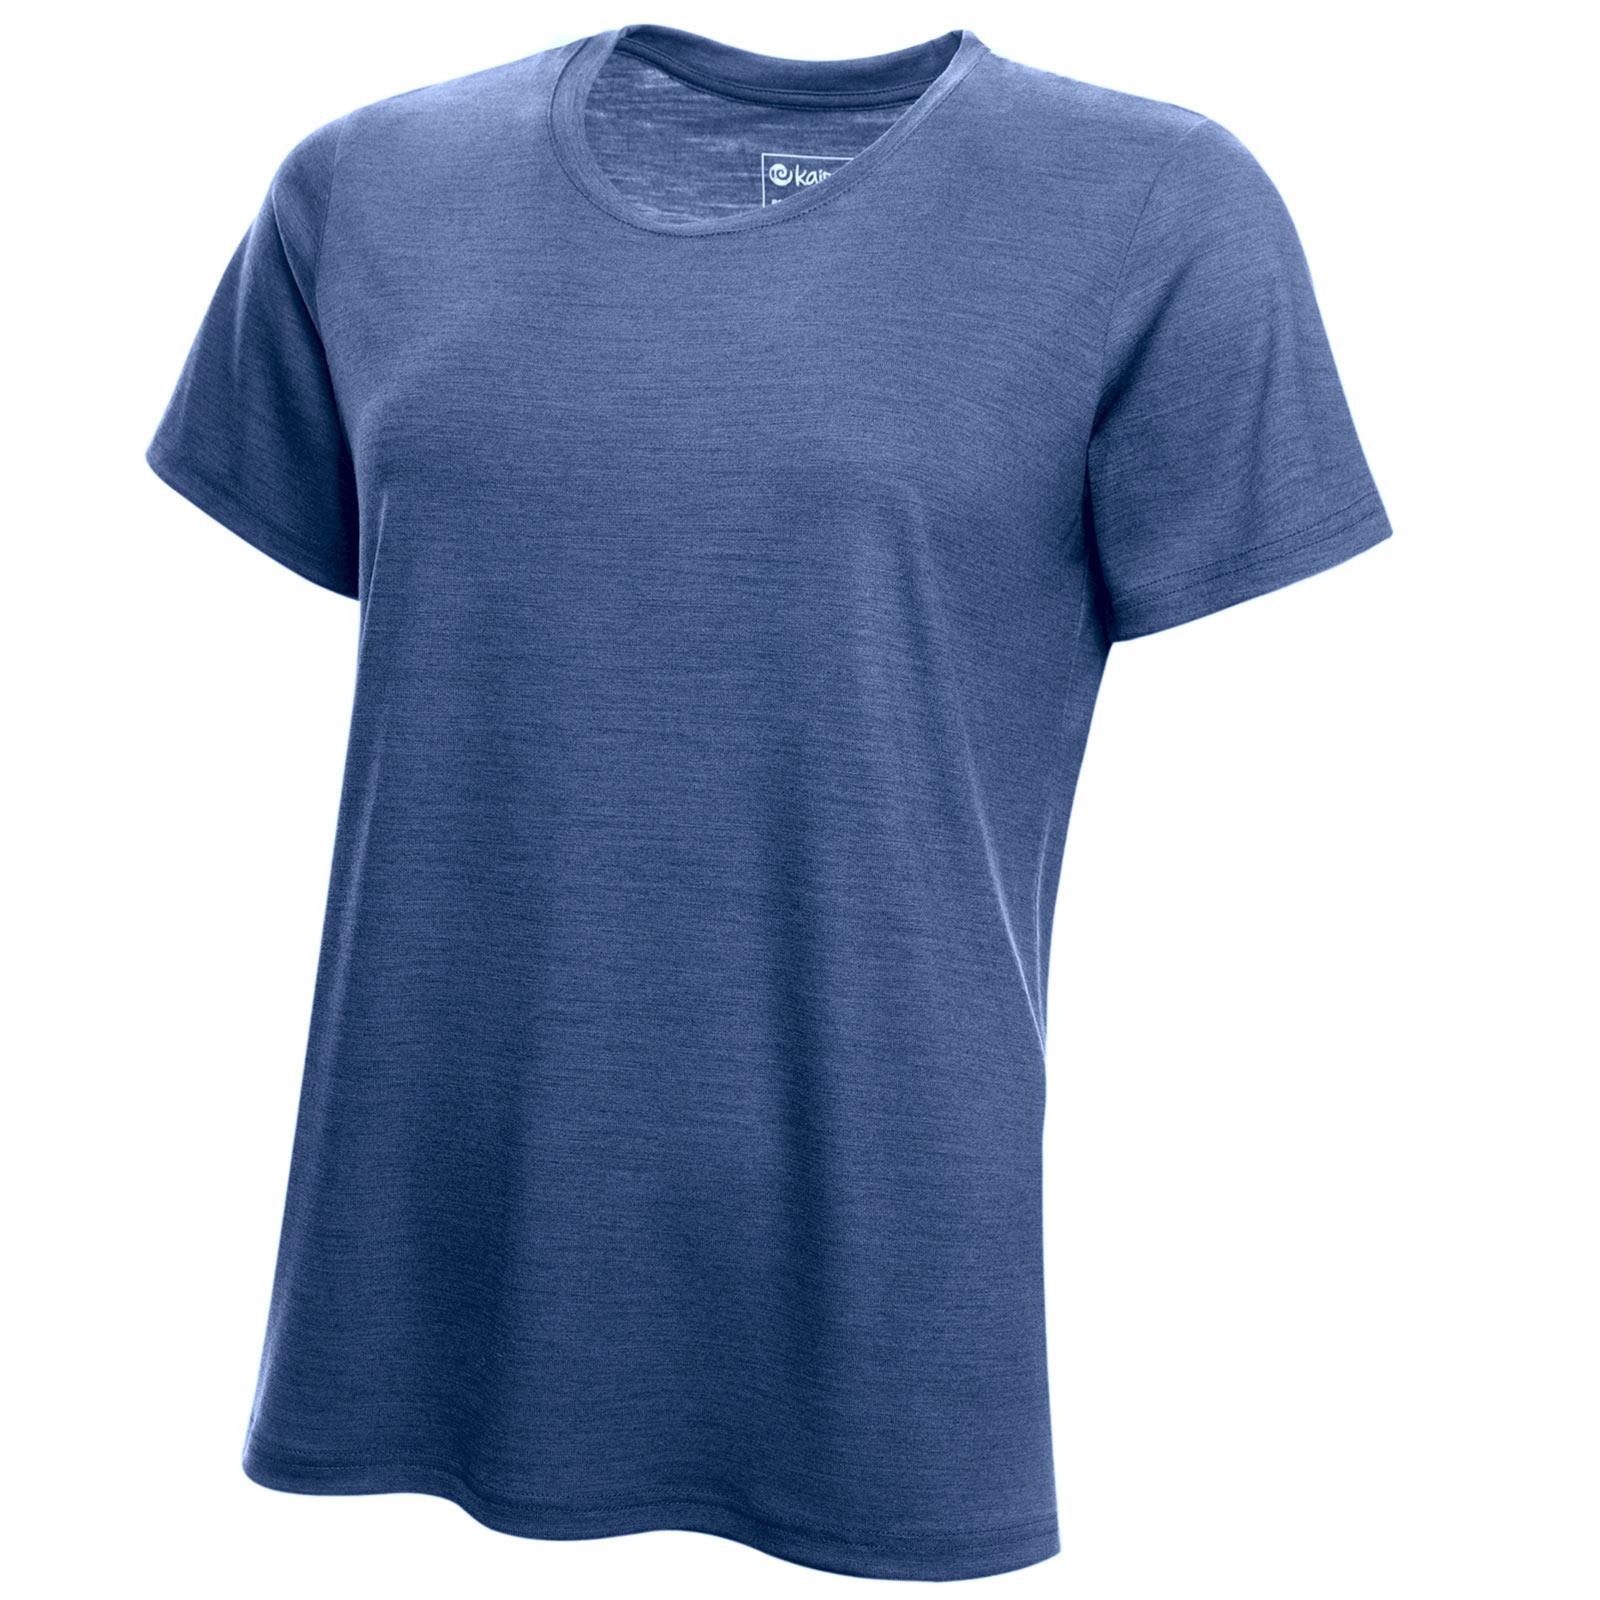 URBAN Merino Shirt Damen Kurzarm Regular 200